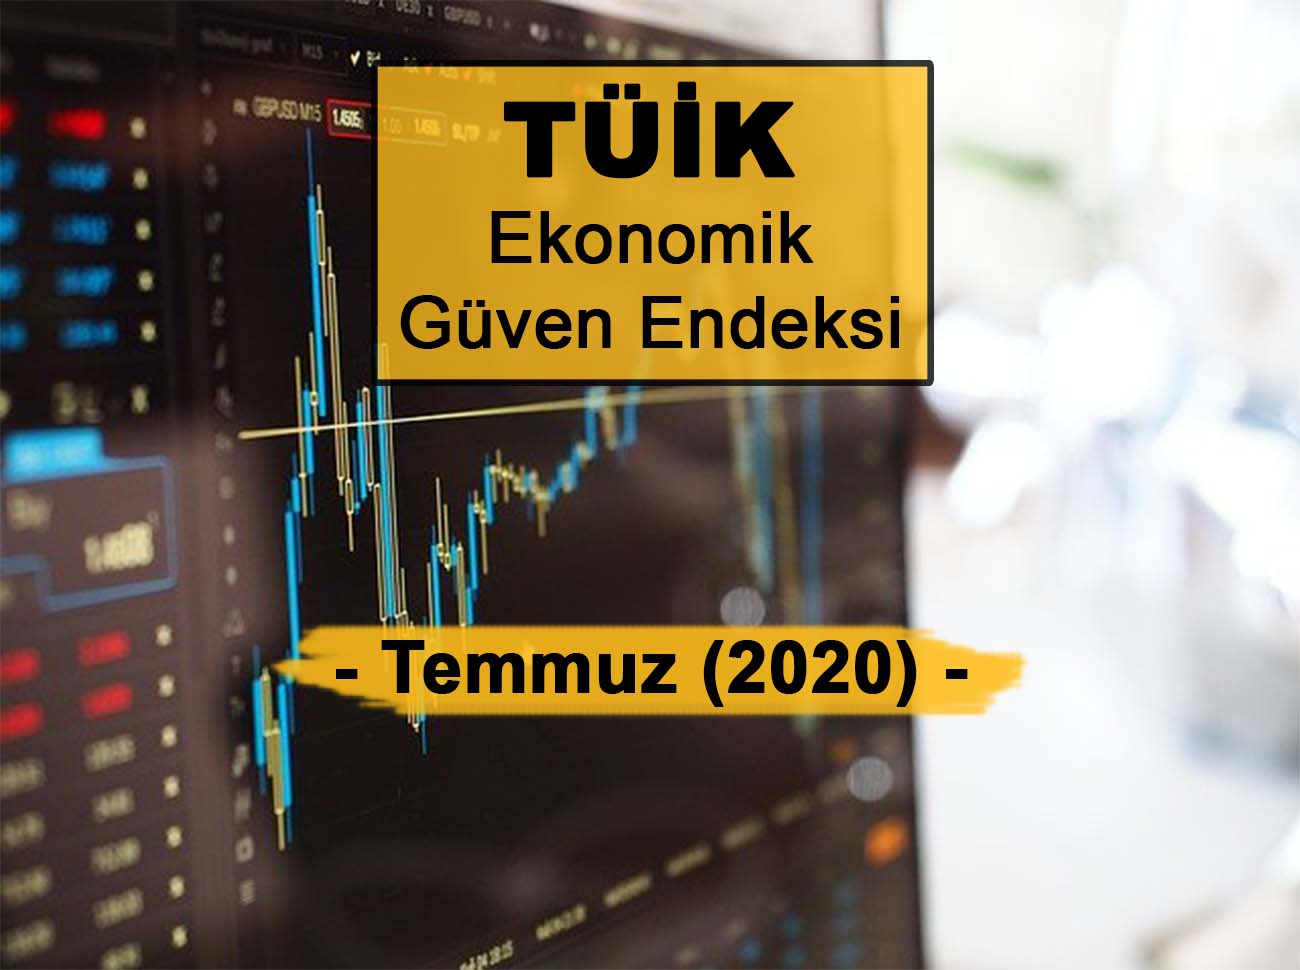 Ekonomik Güven Endeksi Temmuz 2020